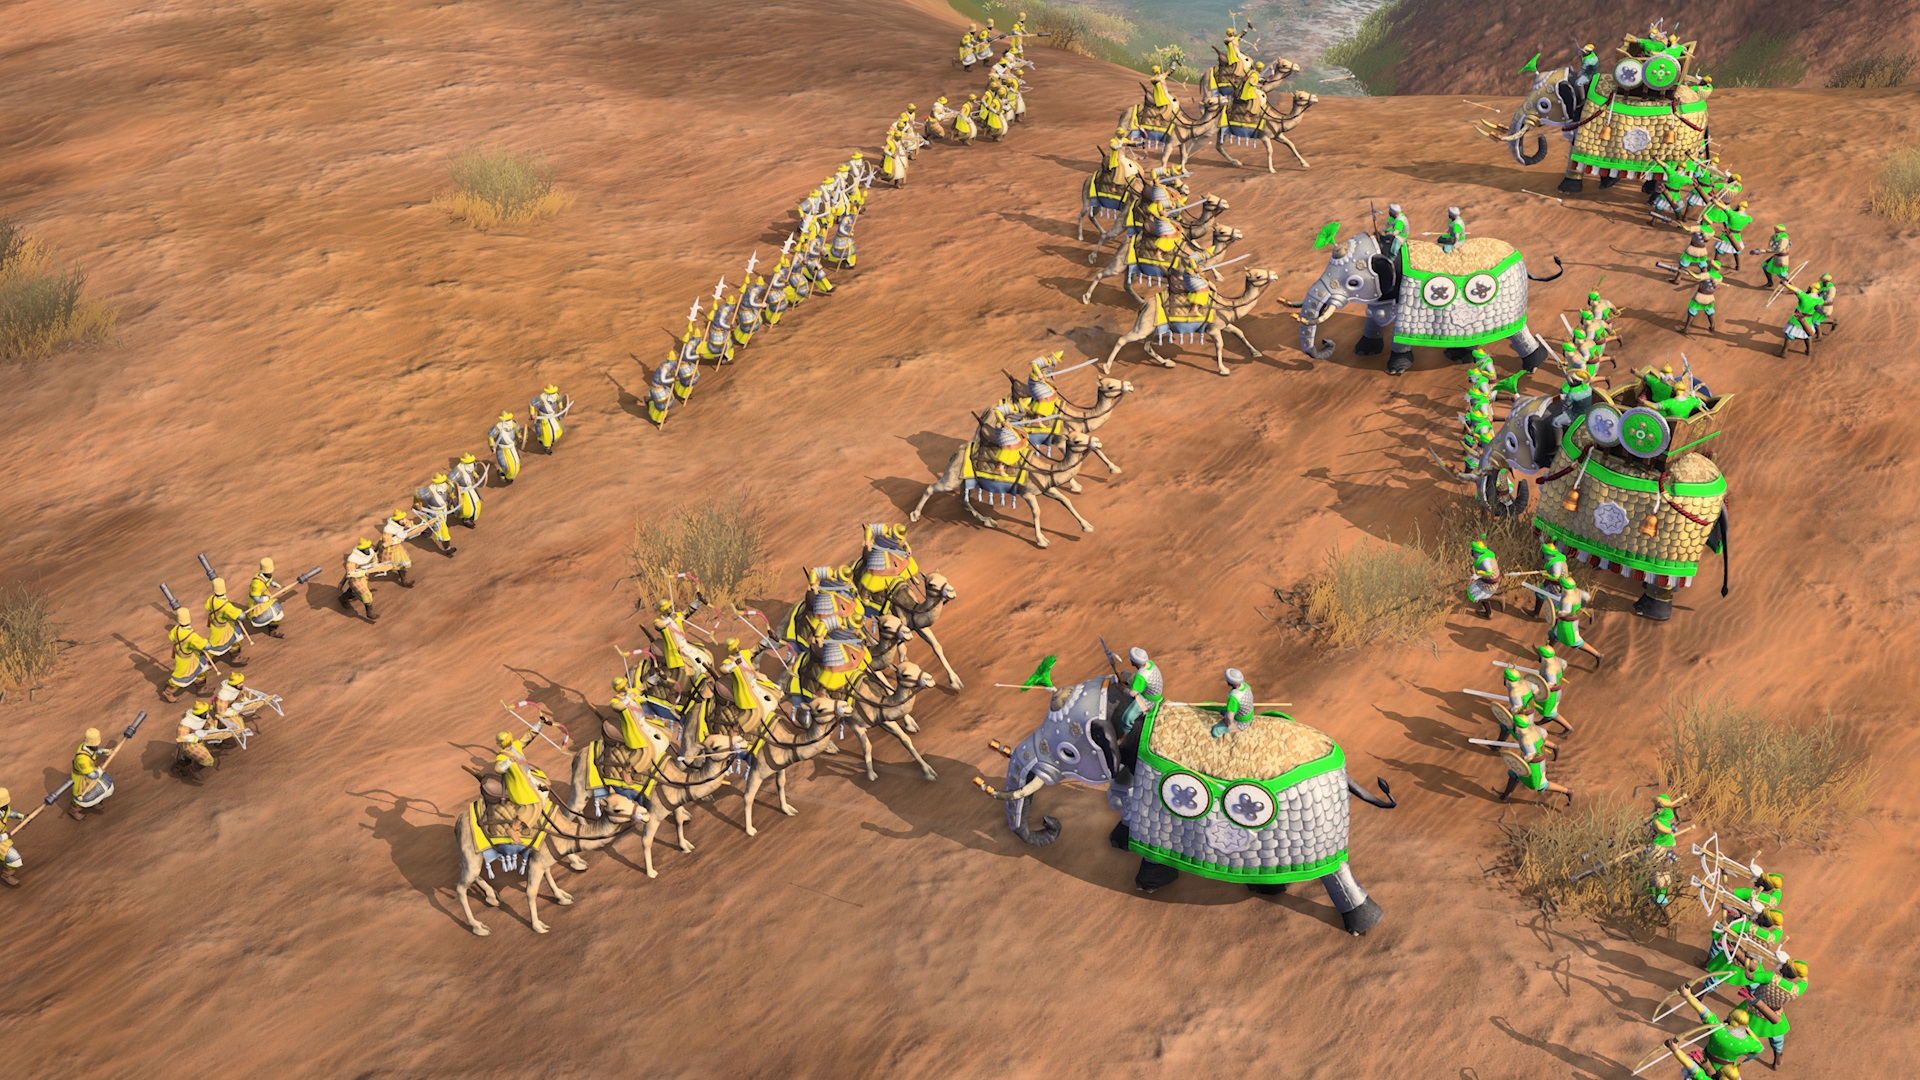 Age of Empires 4 Delhi Sultanate civilisation guide